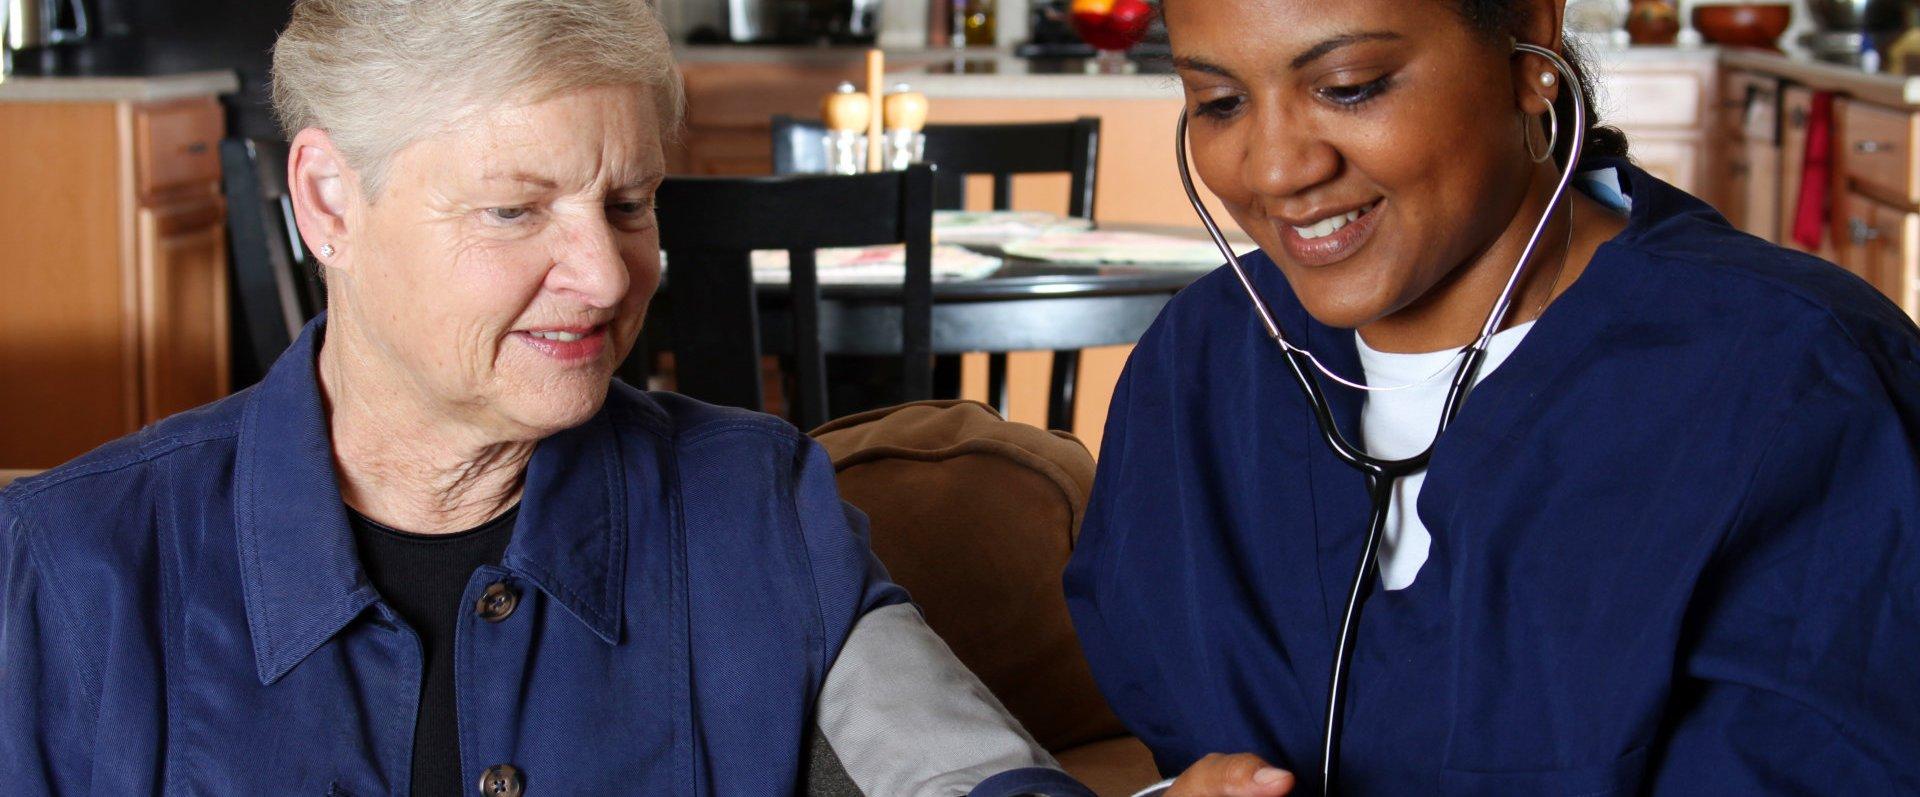 nurse checking the health of an elderly woman